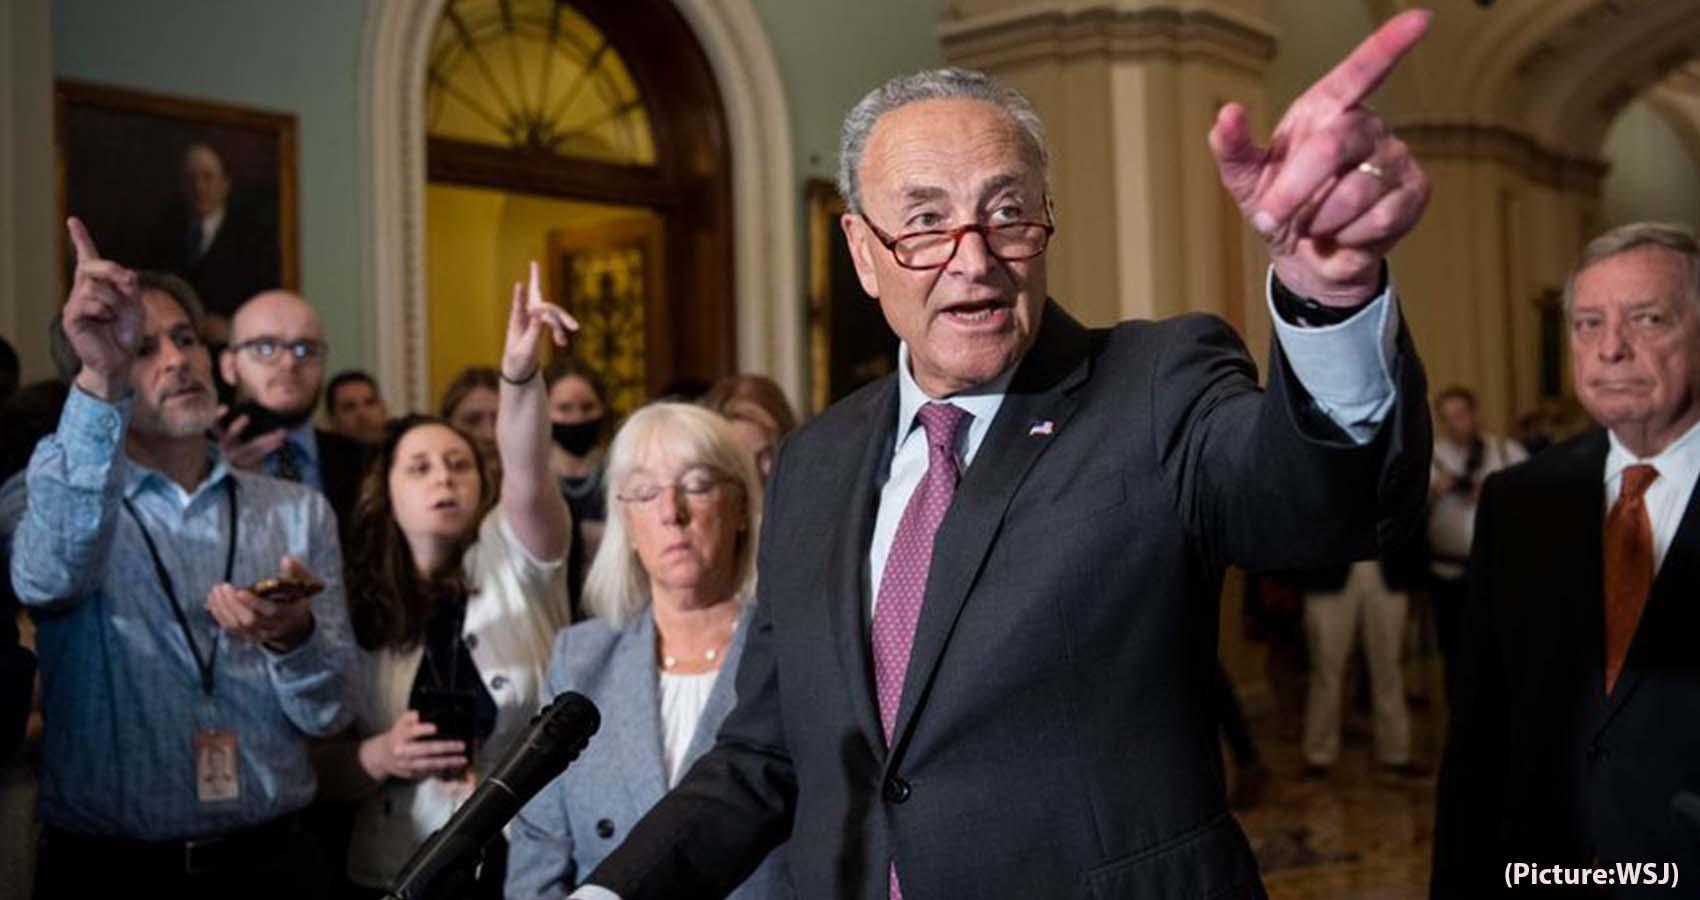 Senate's $3.5 Trillion Budget Proposal Has Plan for Pathway to Citizenship